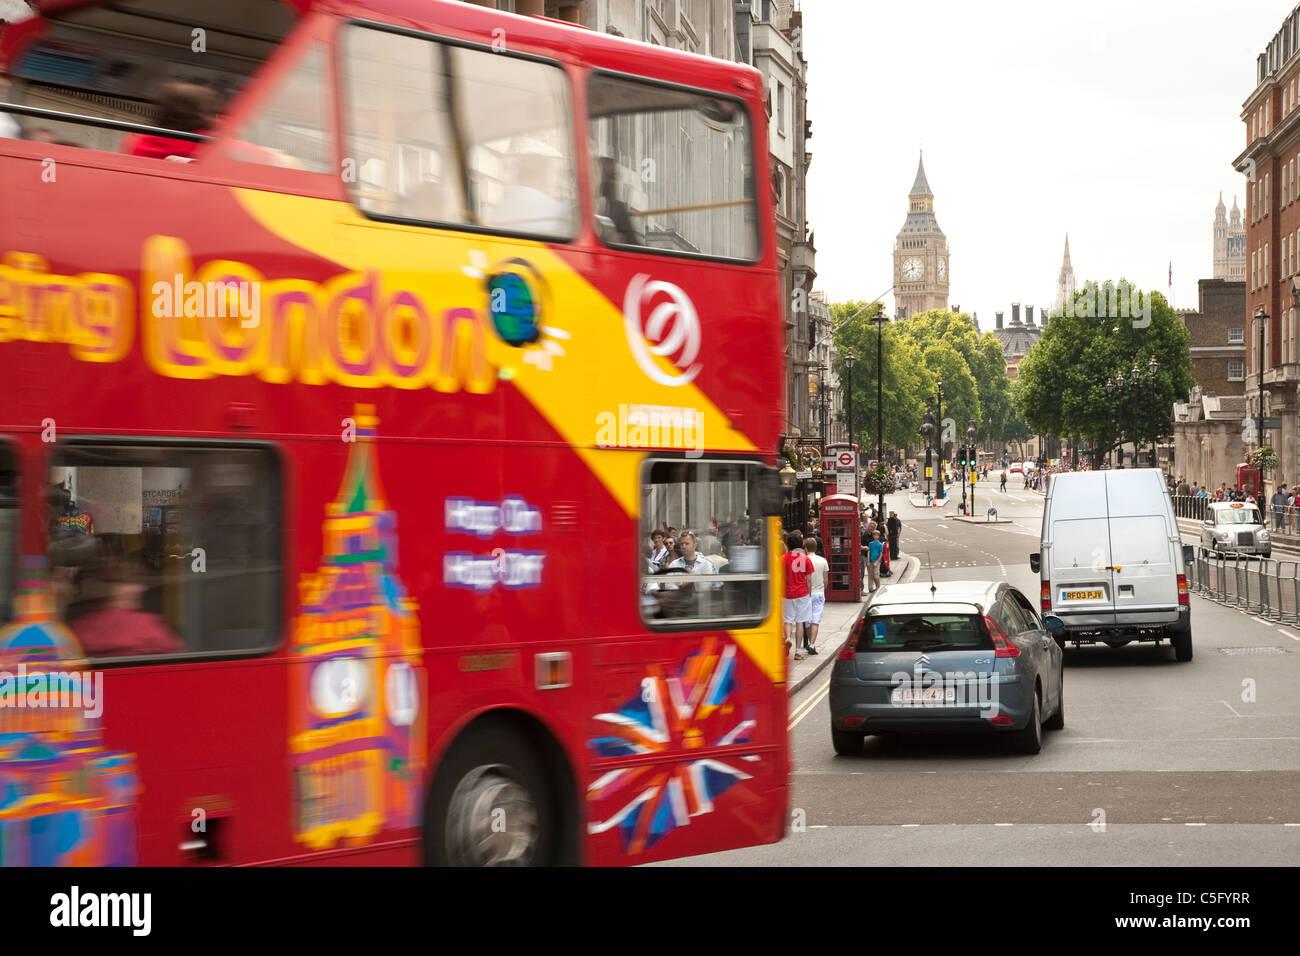 Red L:ondon double decker tour bus, Whitehall, London UK - Stock Image